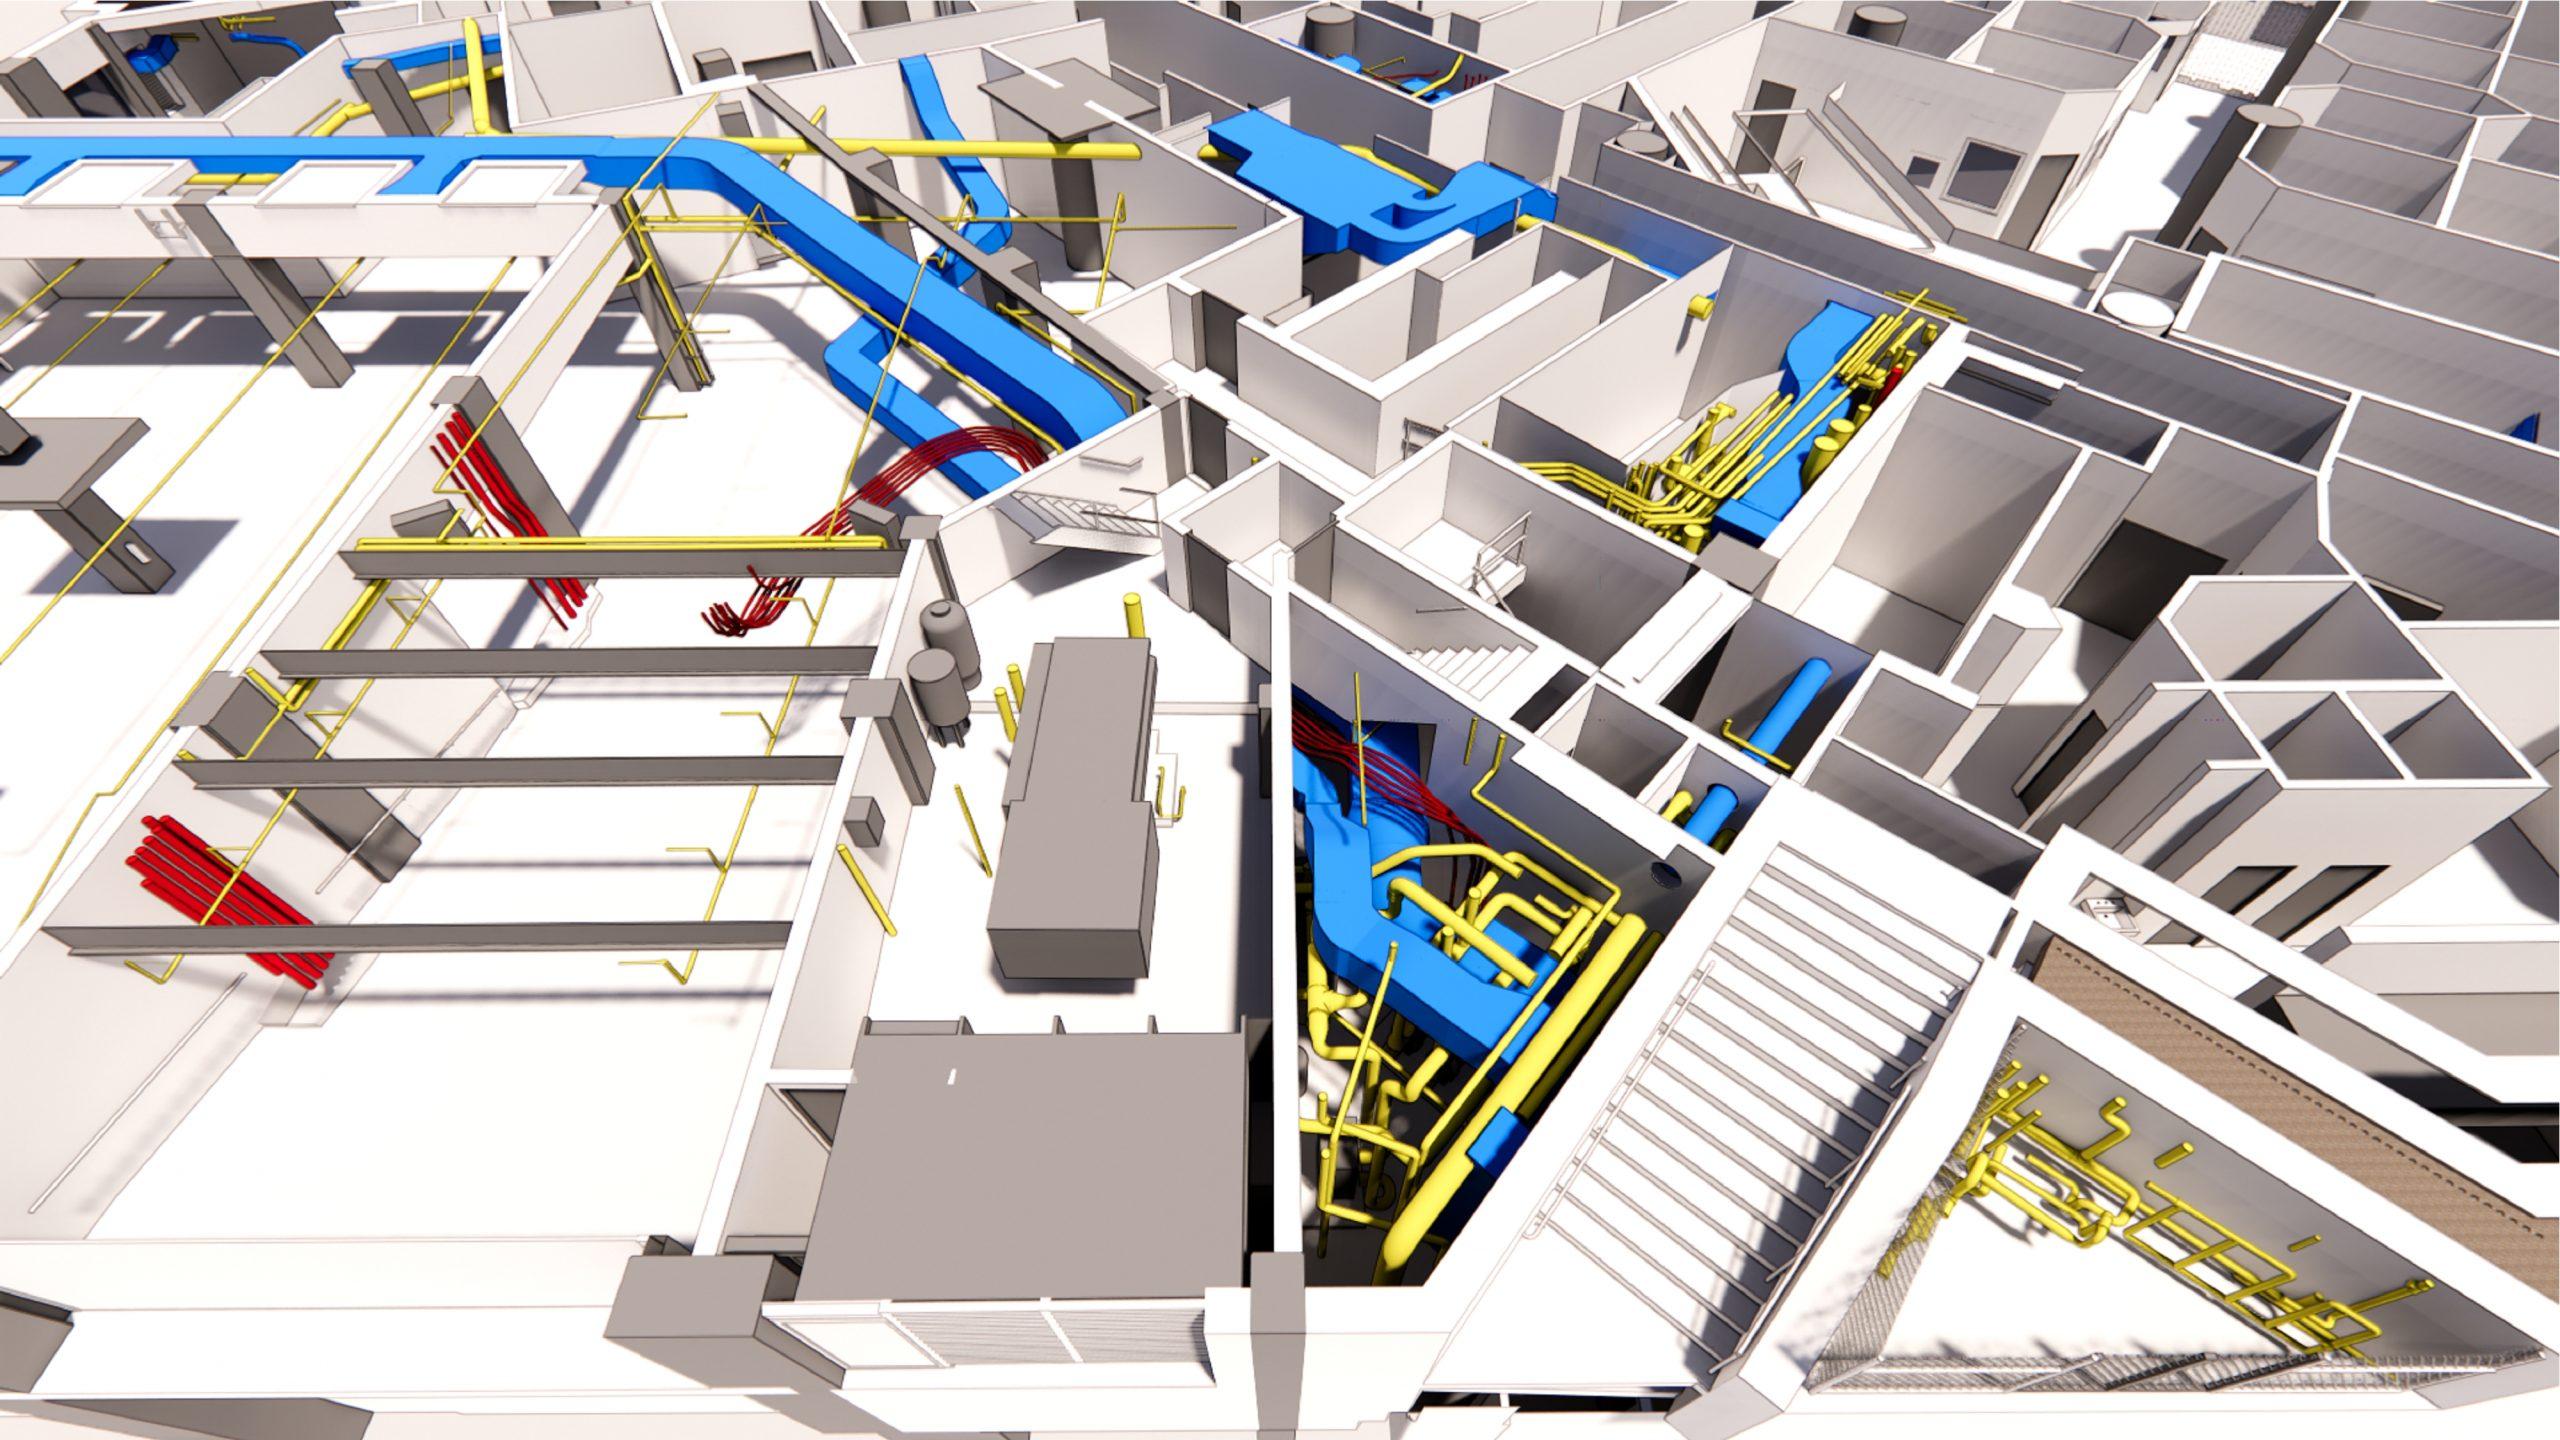 3D rendering utilities 700 University Avenue Toronto